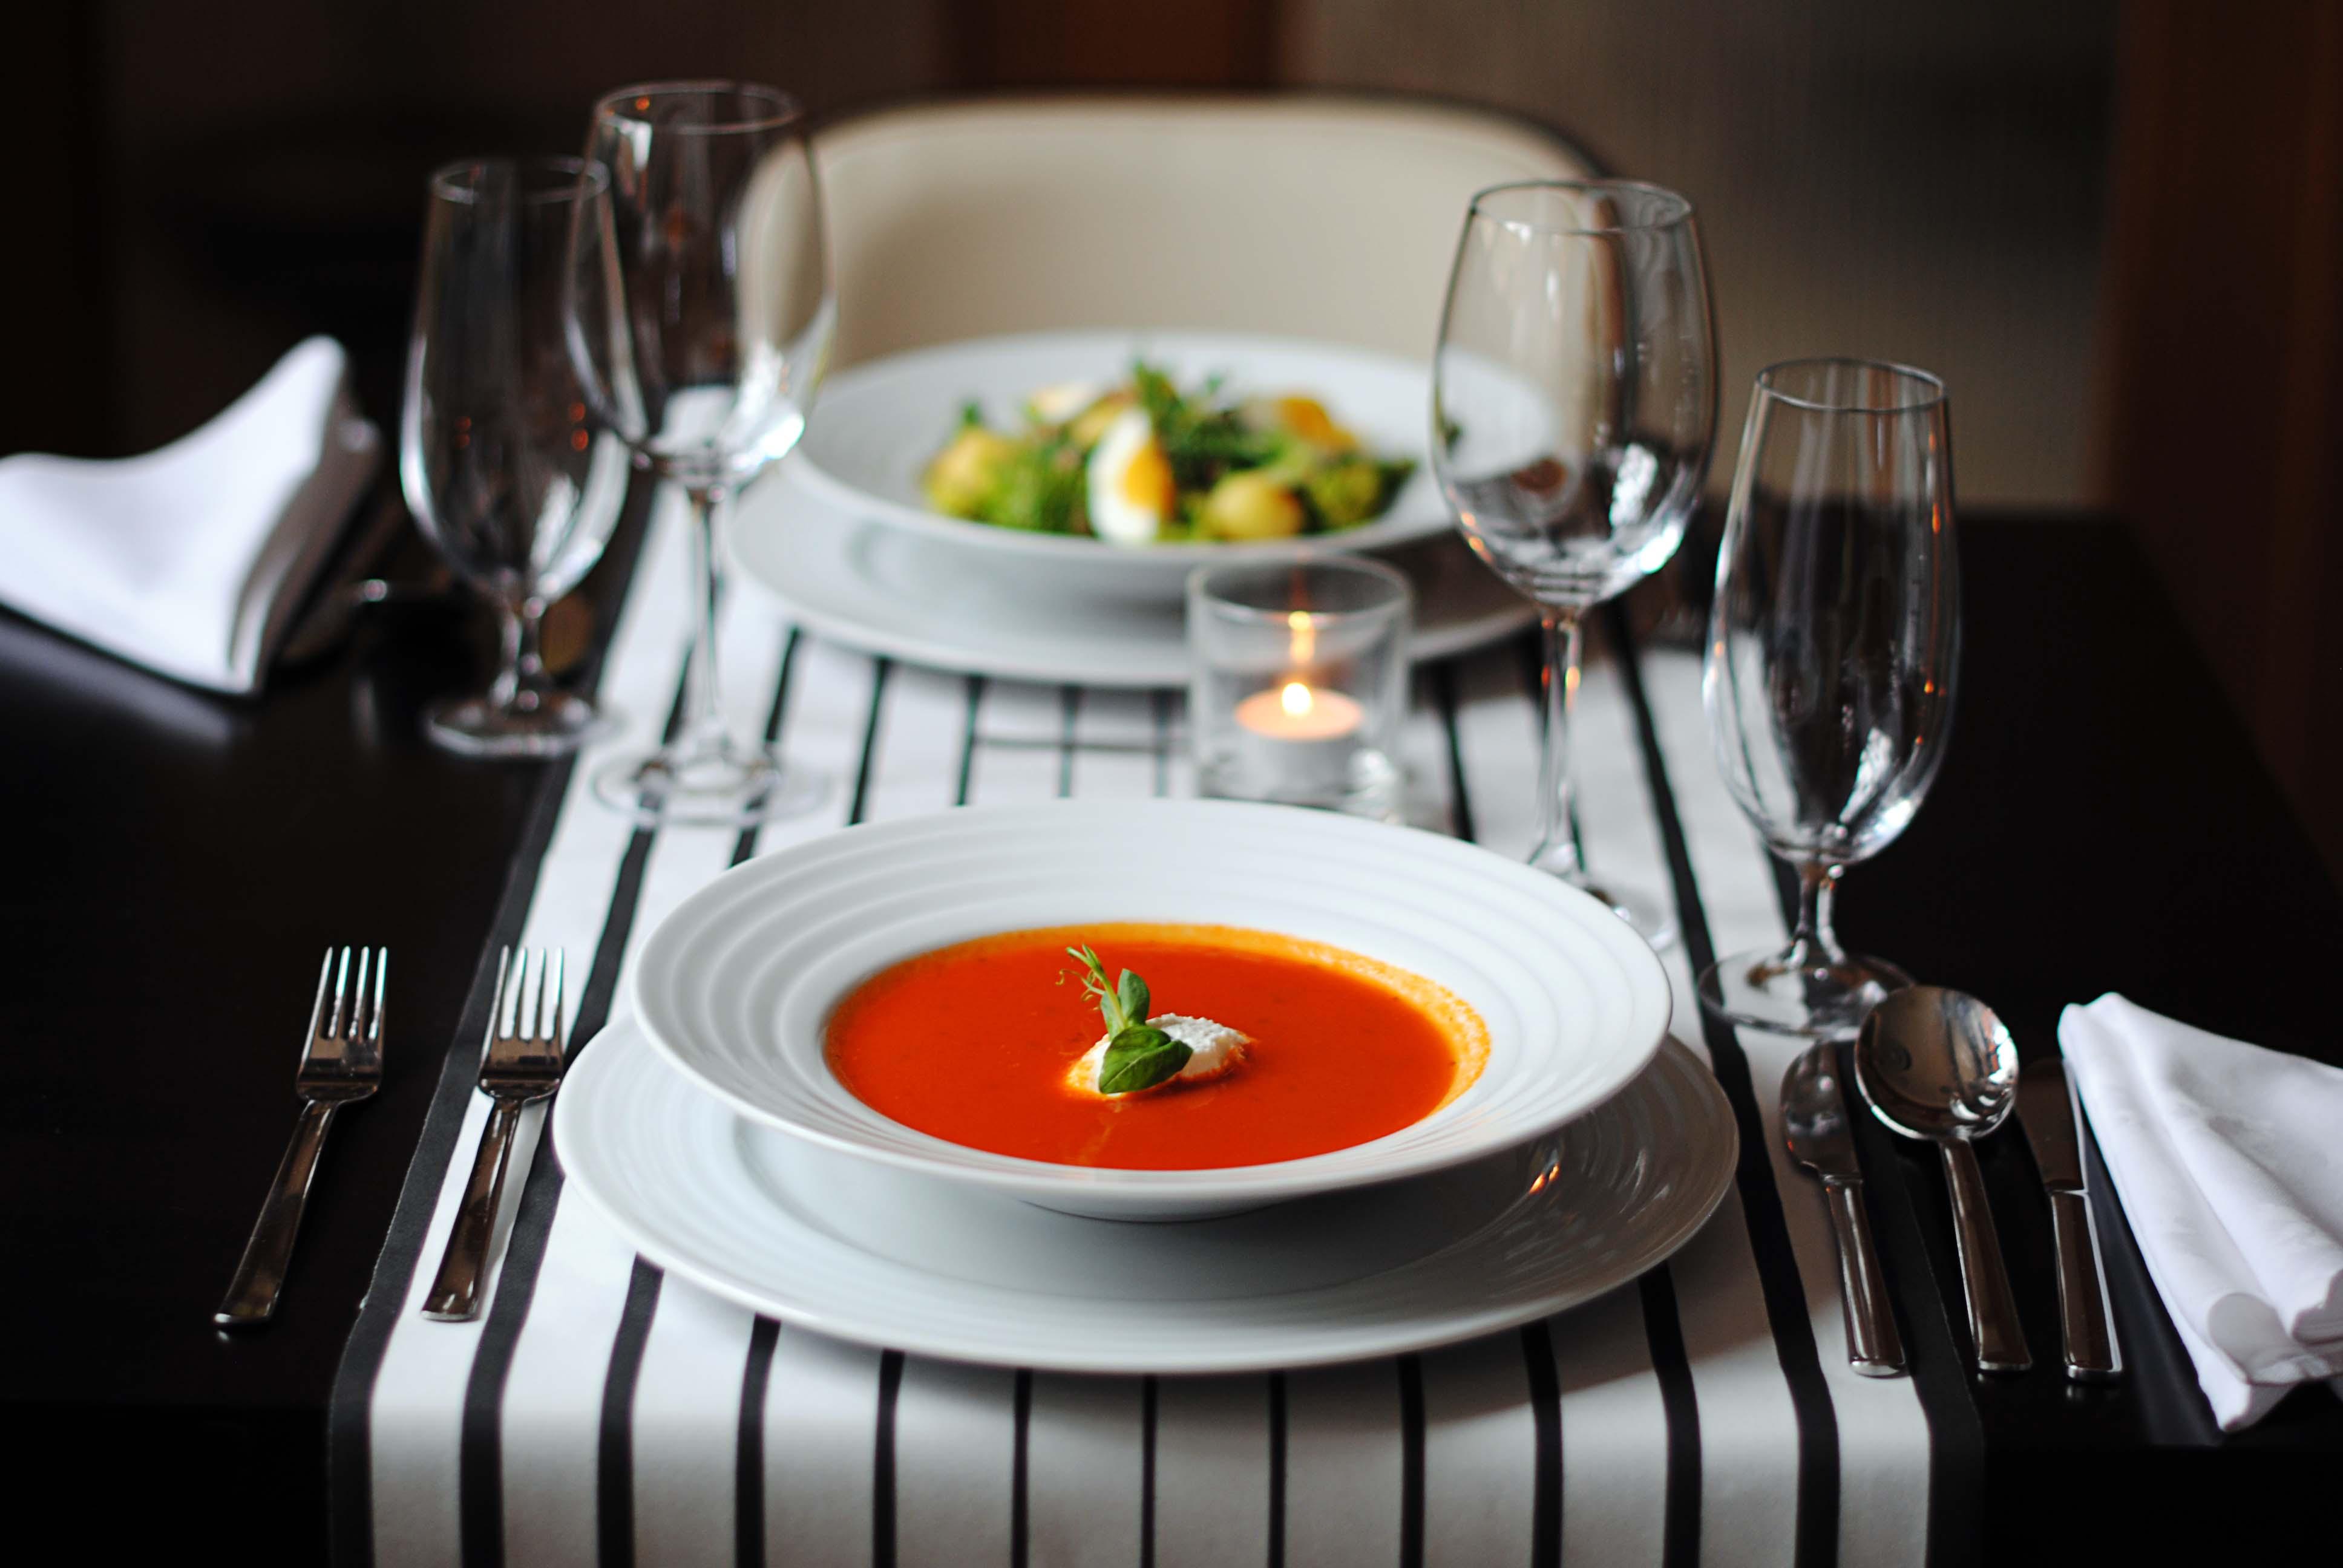 oběd, polévka, salát